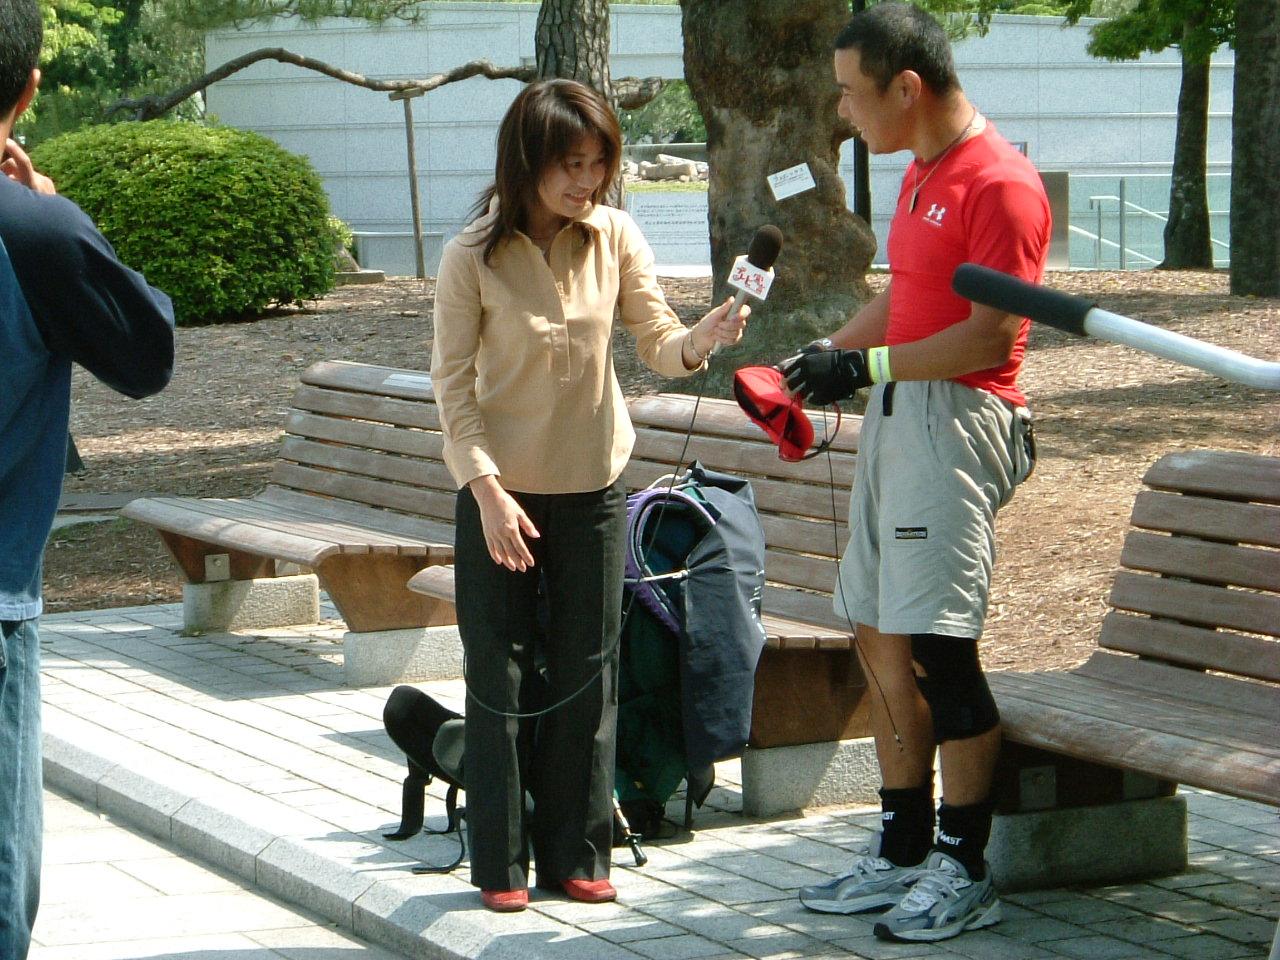 20040512 HTV大隈レポータと(笑顔).JPG